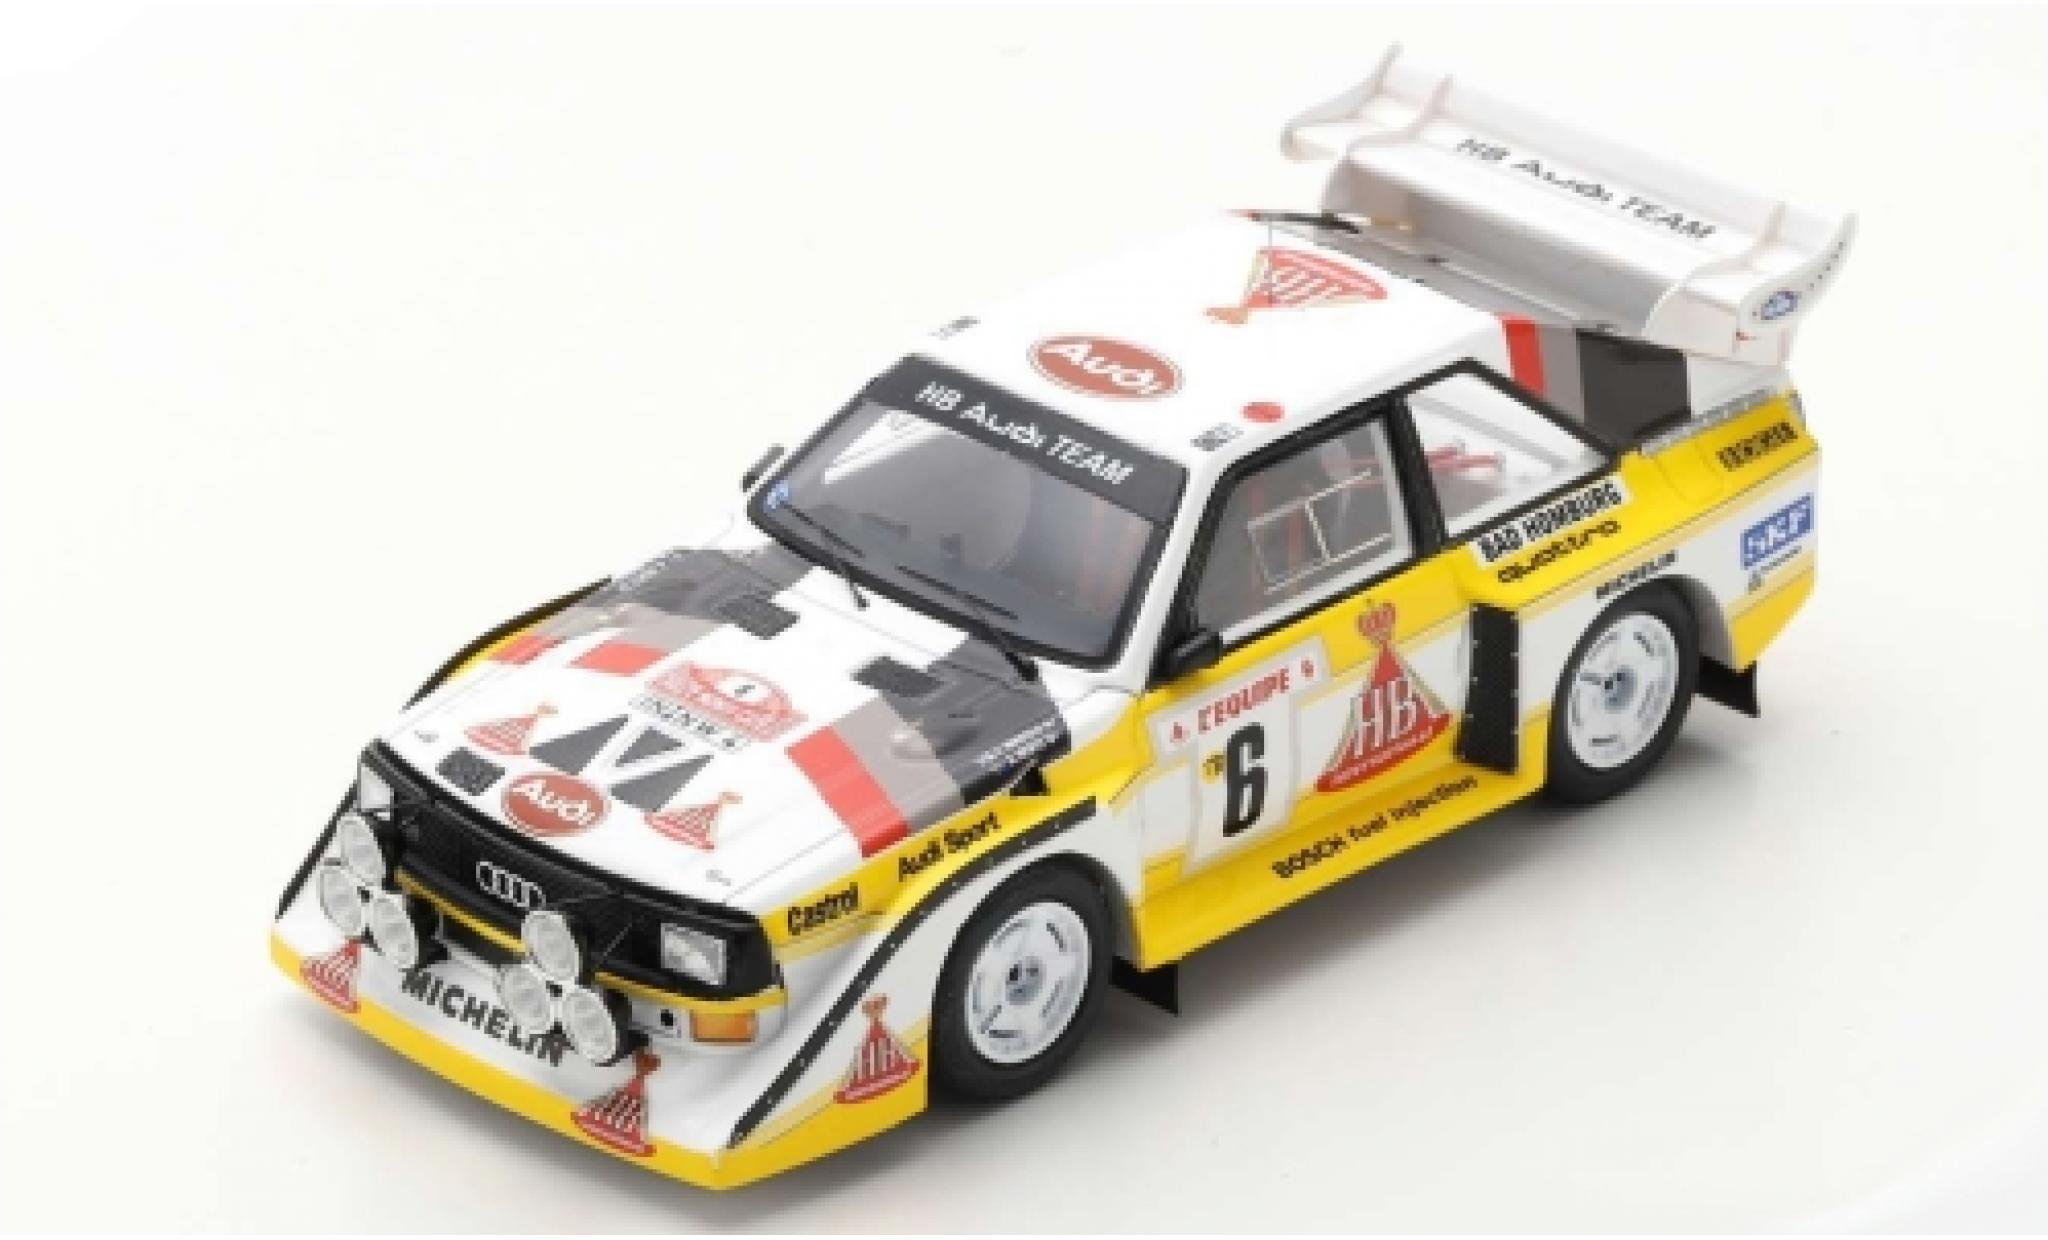 Audi Sport Quattro 1/43 Spark Sport quattro S1 E2 No.6 HB Team HB Rallye WM Rallye Monte Carlo 1986 H.Mikkola/A.Hertz